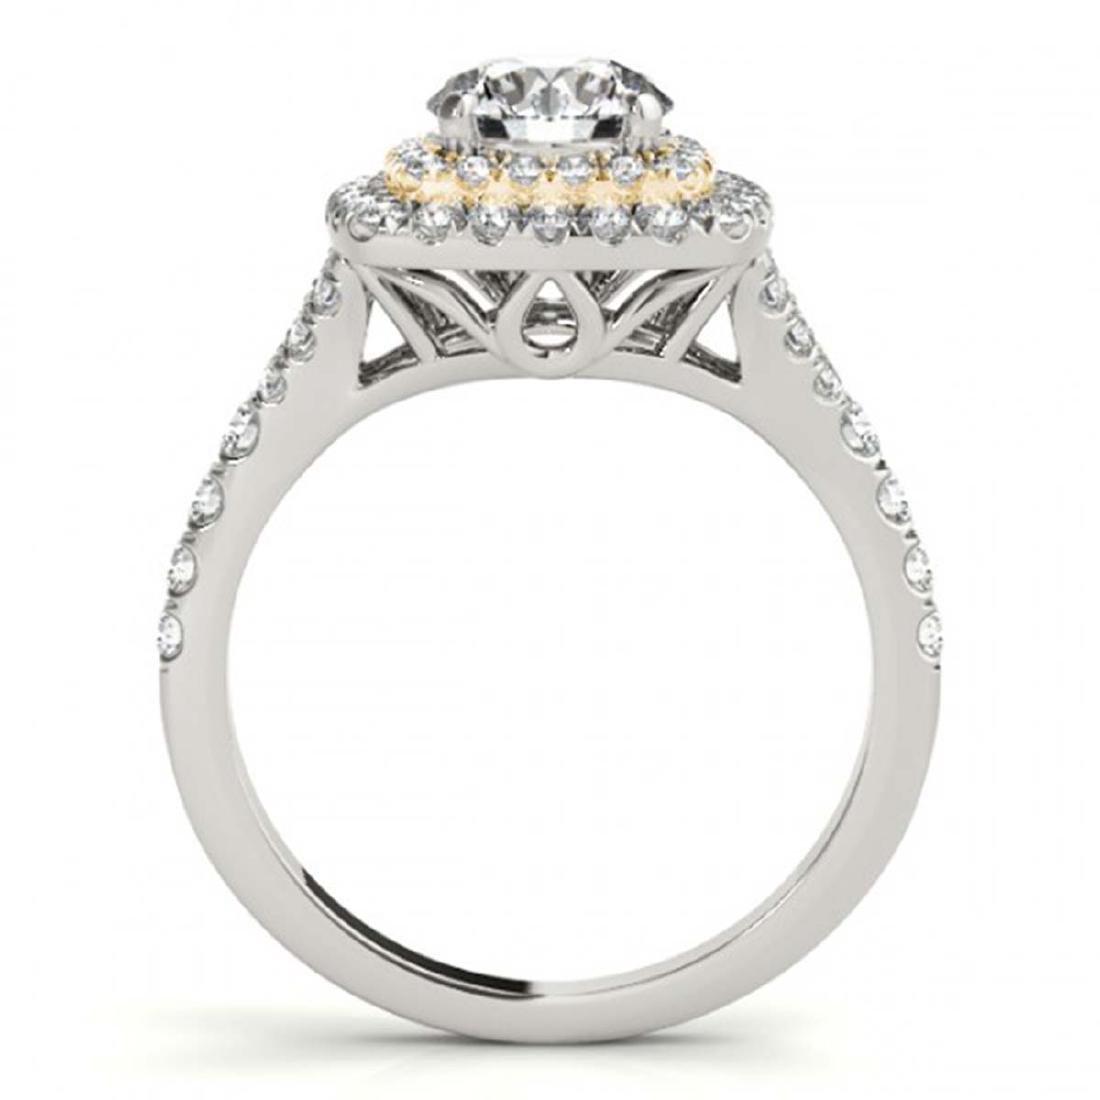 1.60 ctw VS/SI Diamond Solitaire Halo Ring 18K White & - 2